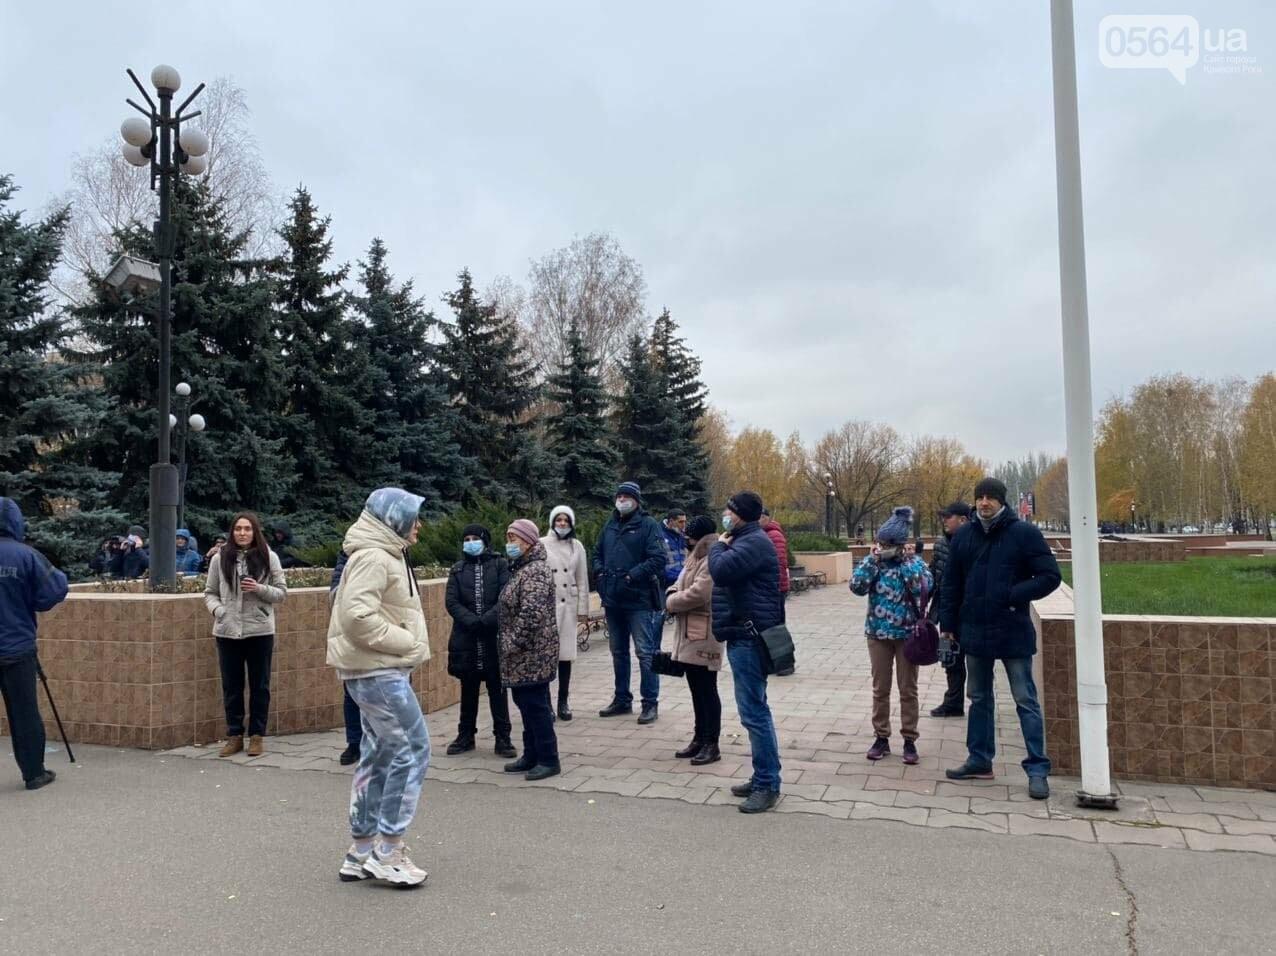 Представители малого бизнеса продолжили протест возле мэрии Кривого Рога, - ФОТО, ВИДЕО, фото-15